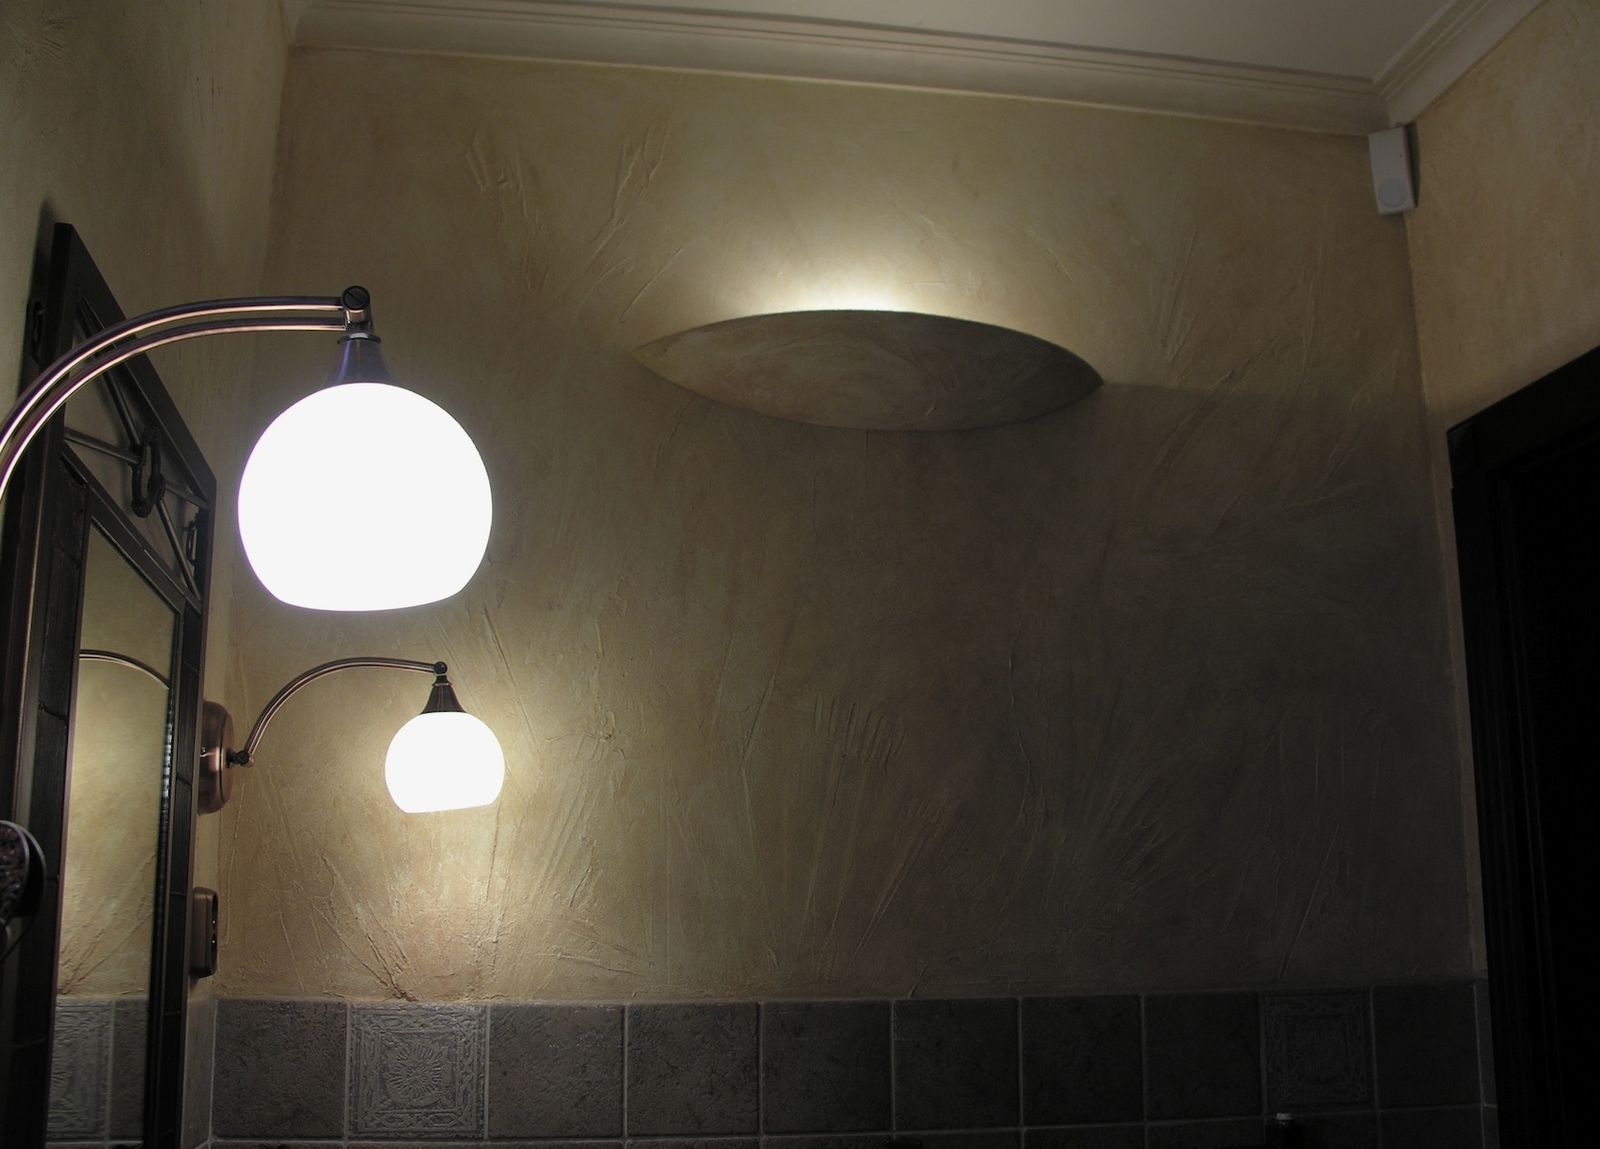 Baddesign - Basrelief - Leuchten